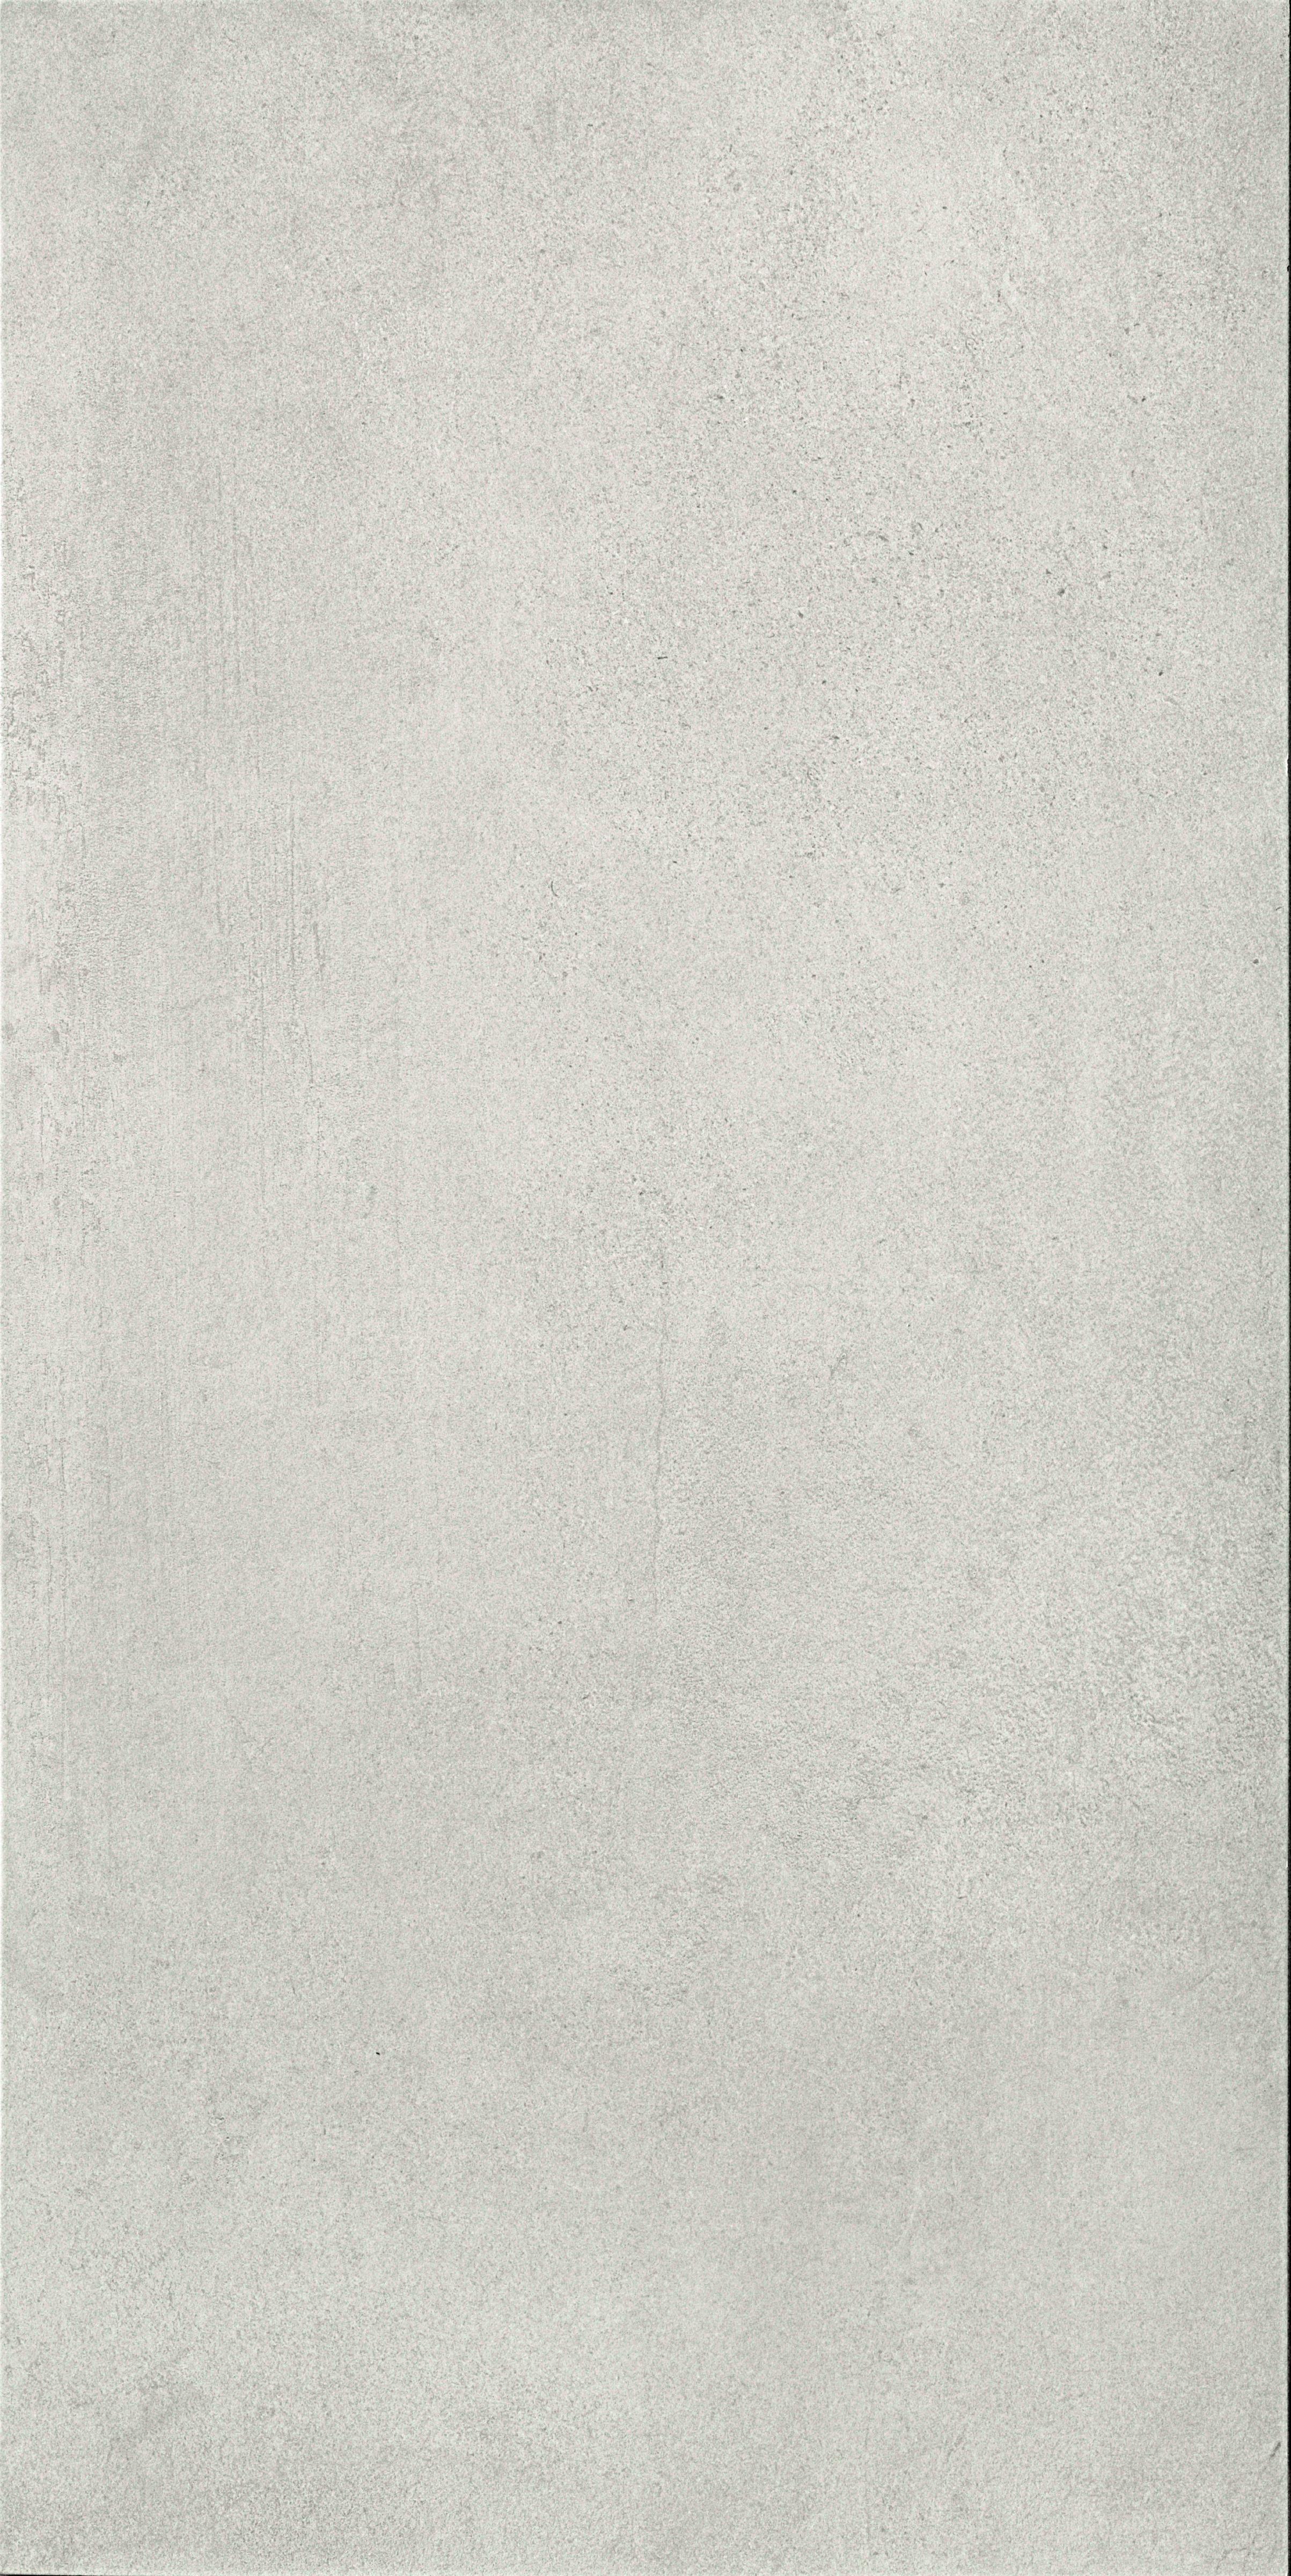 CEMBI1224R – Bianco Rasato